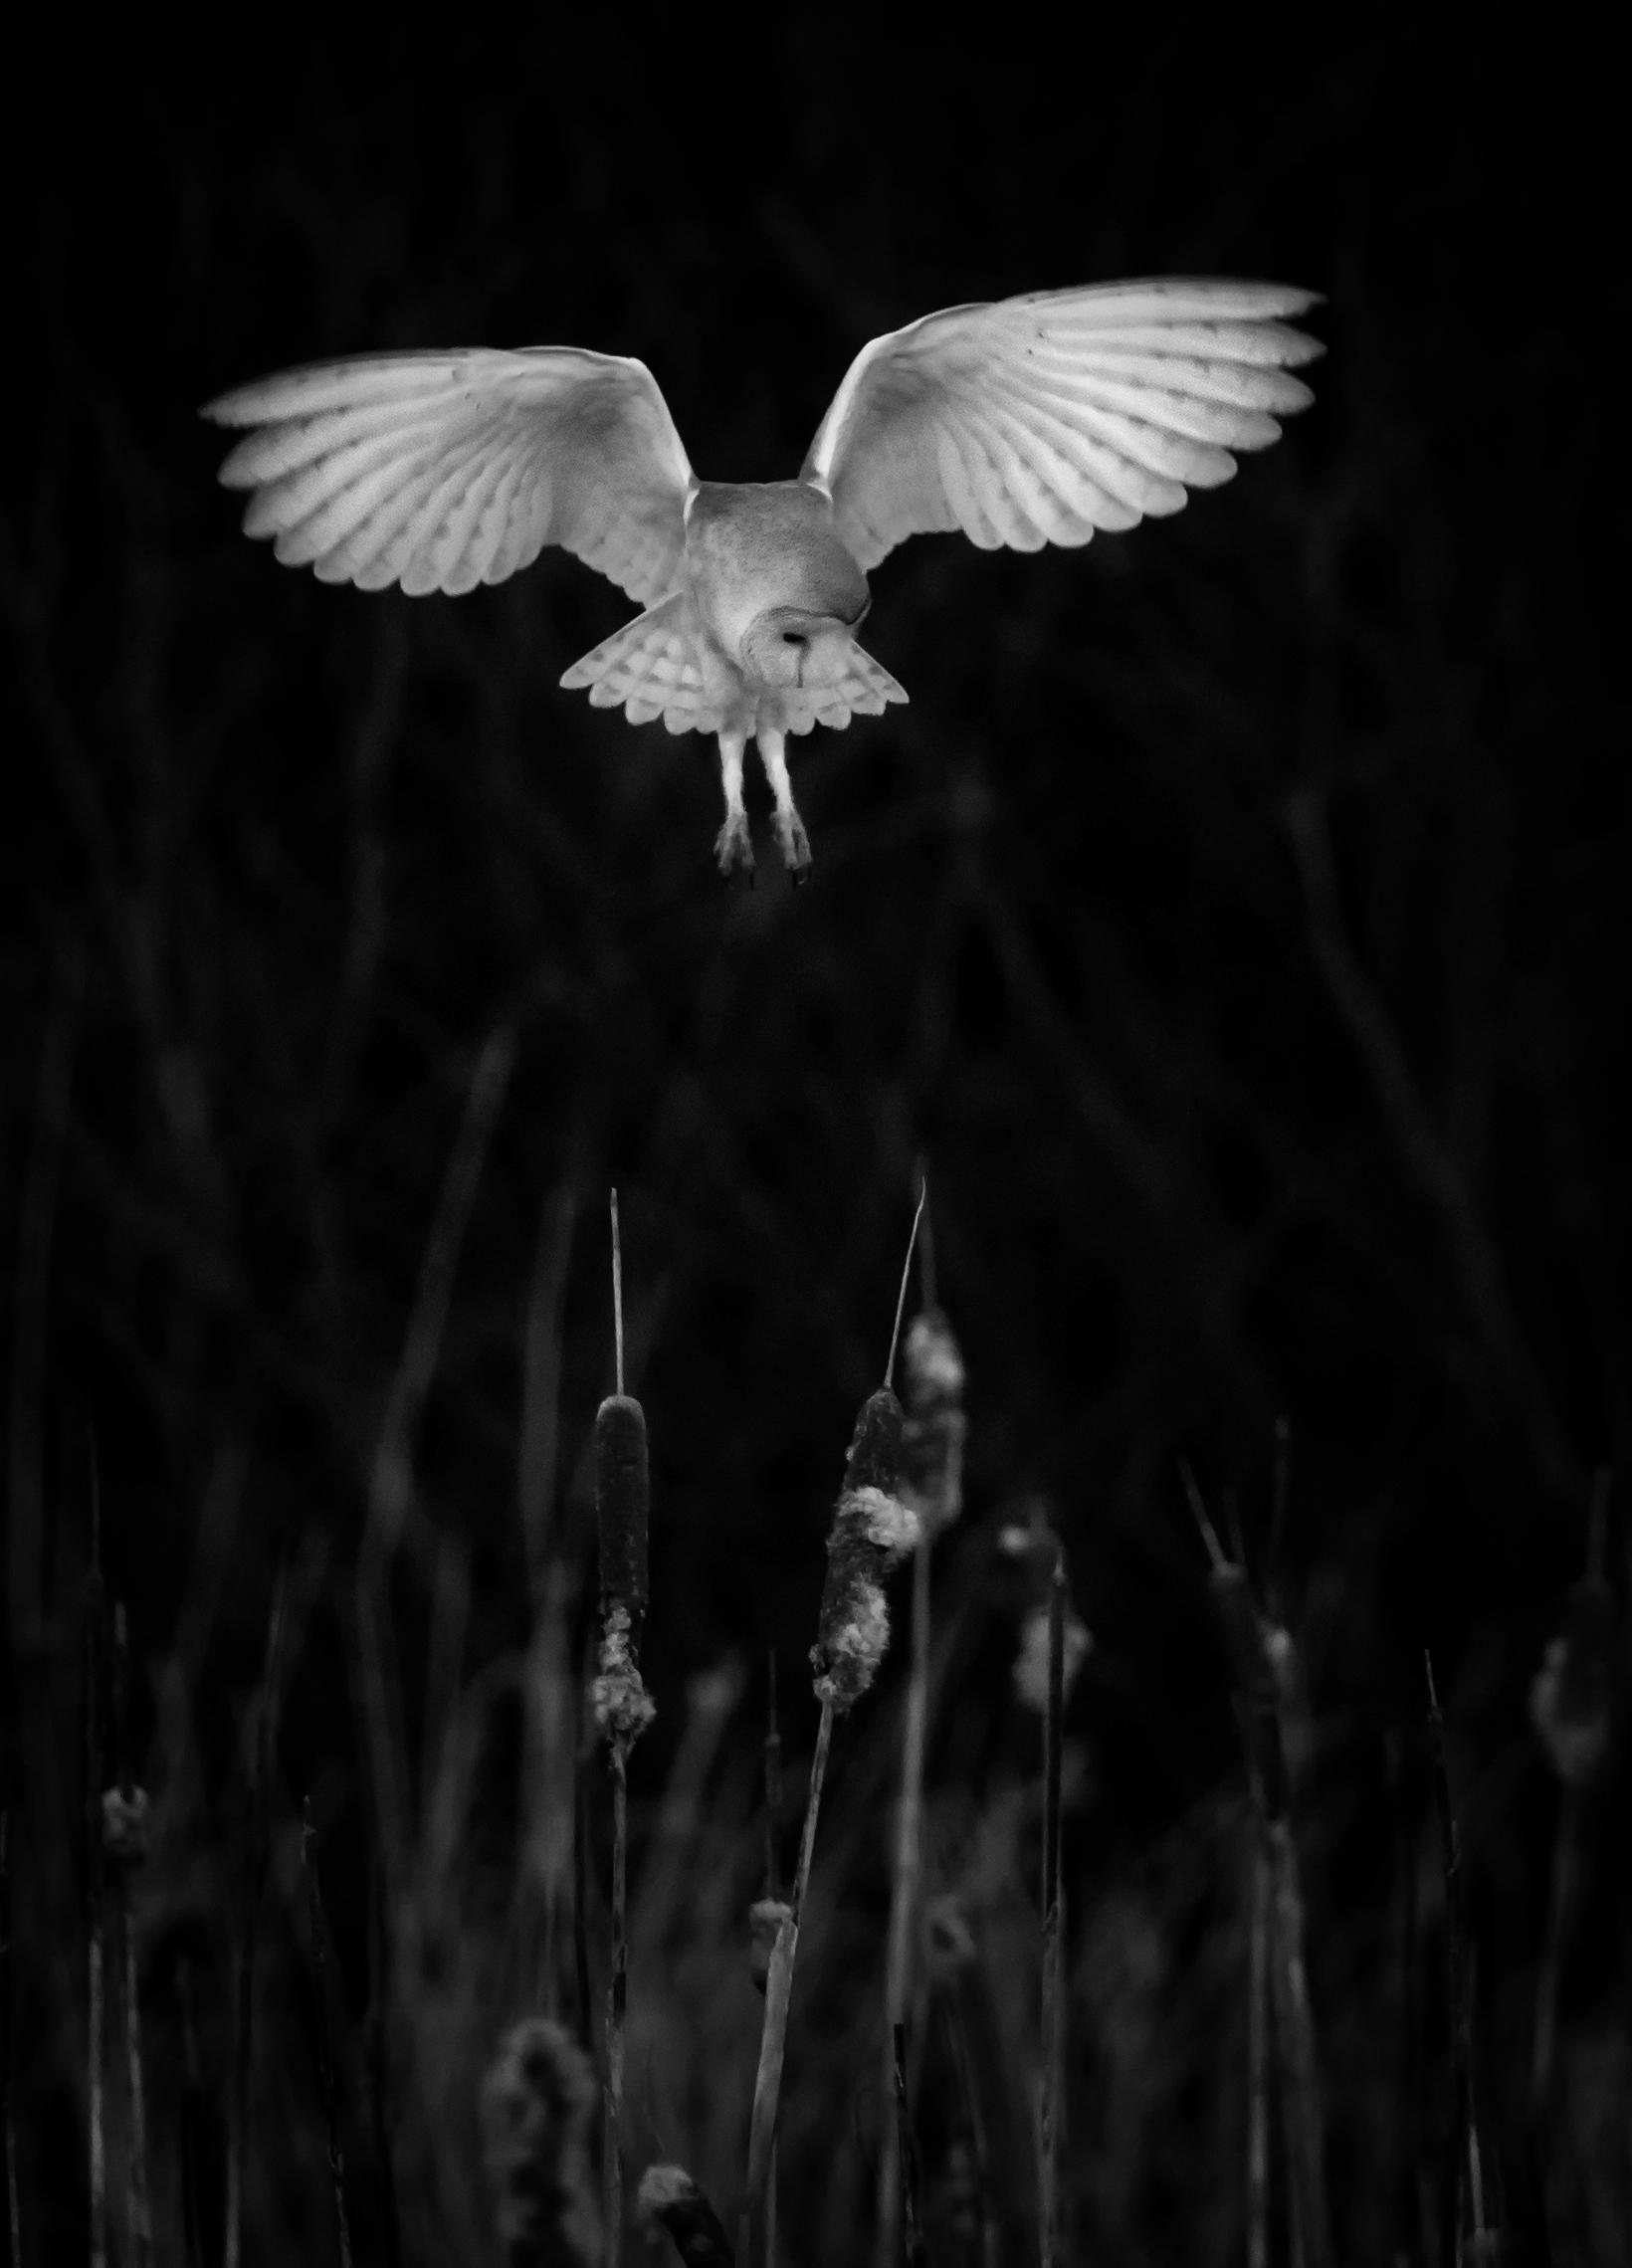 Hovering Barn Owl B&W.jpg